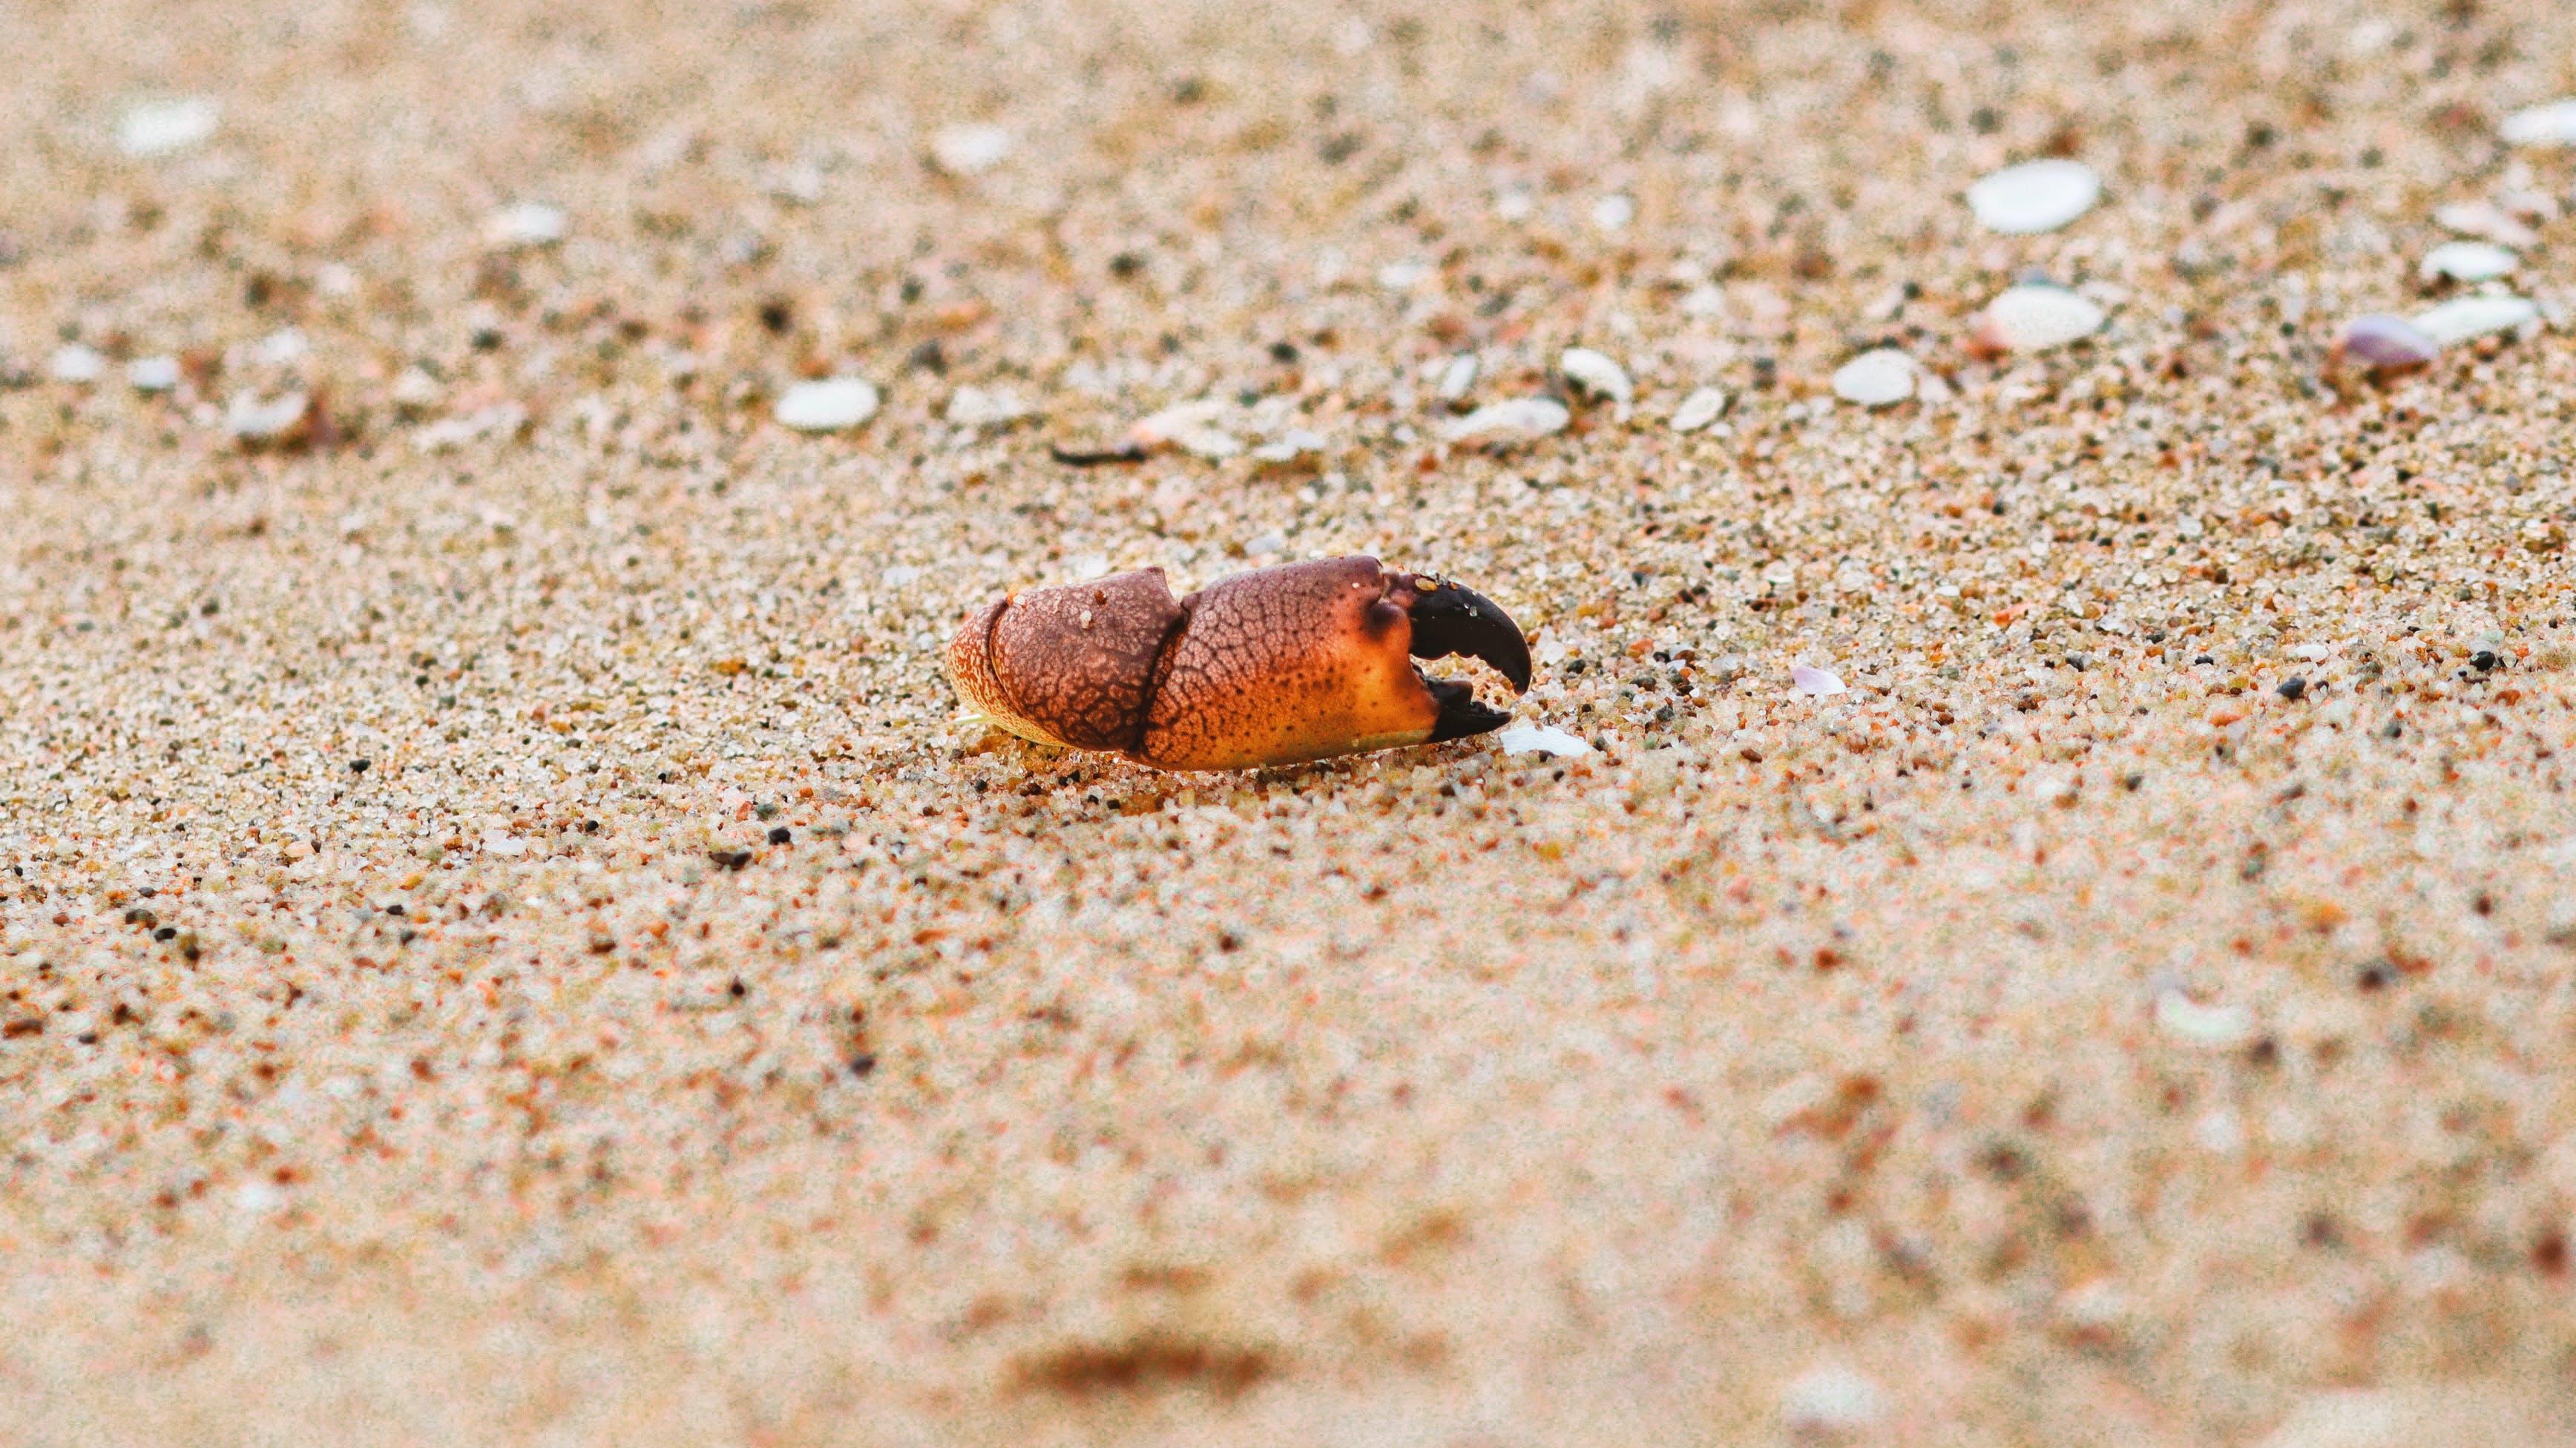 Free stock photo of #crab #ocean #sand #hand #sea #mud #sharp #broken